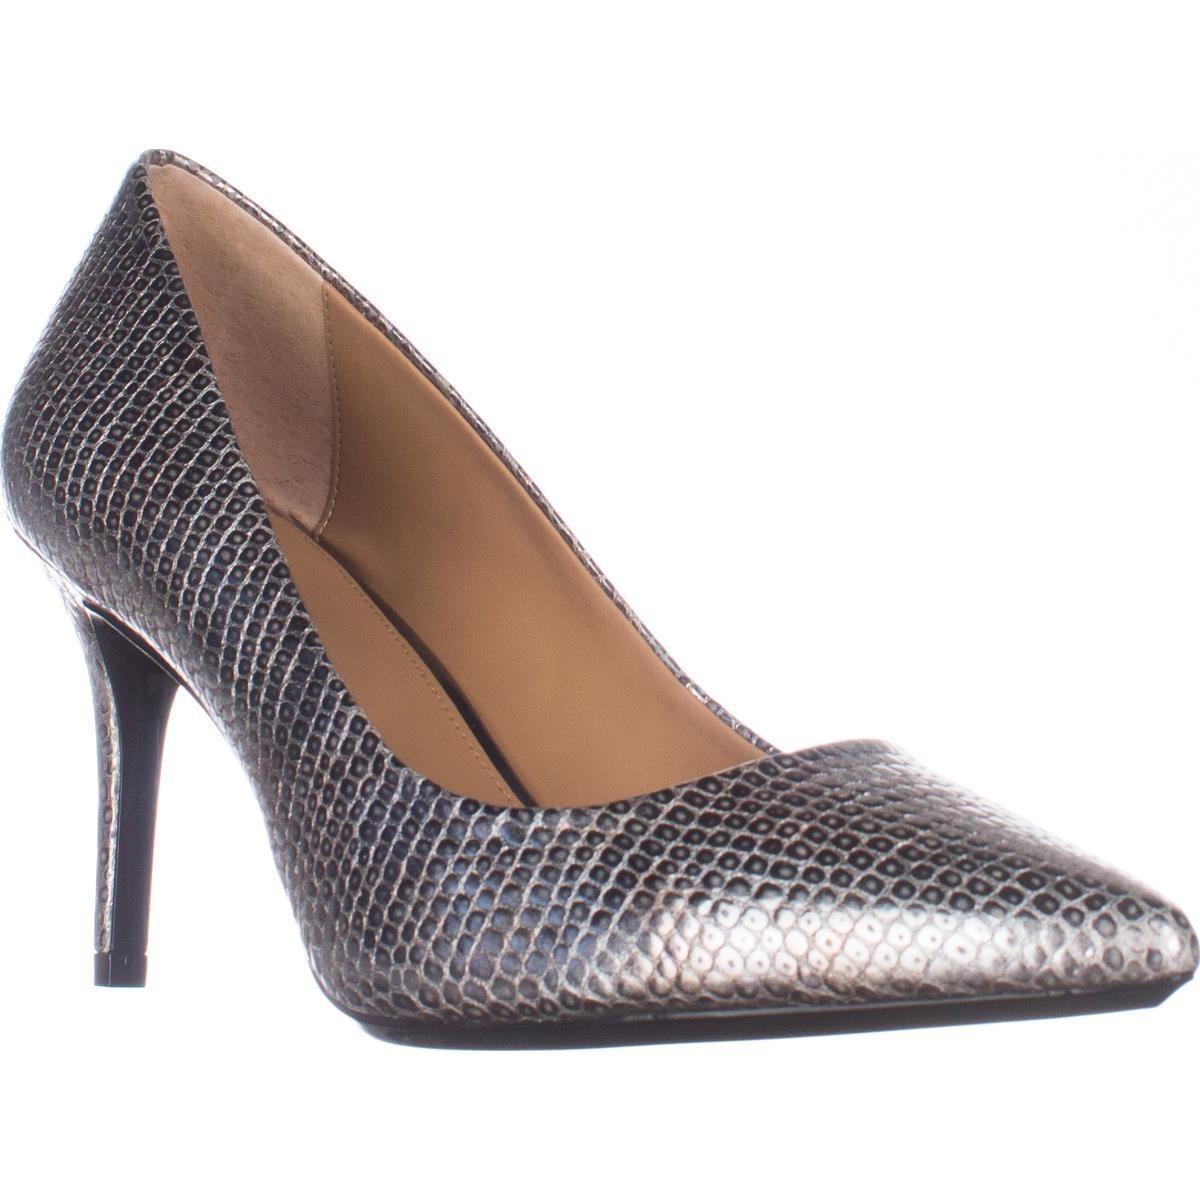 Lyst Calvin Klein 205w39nyc Gayle Classic Pump Heels